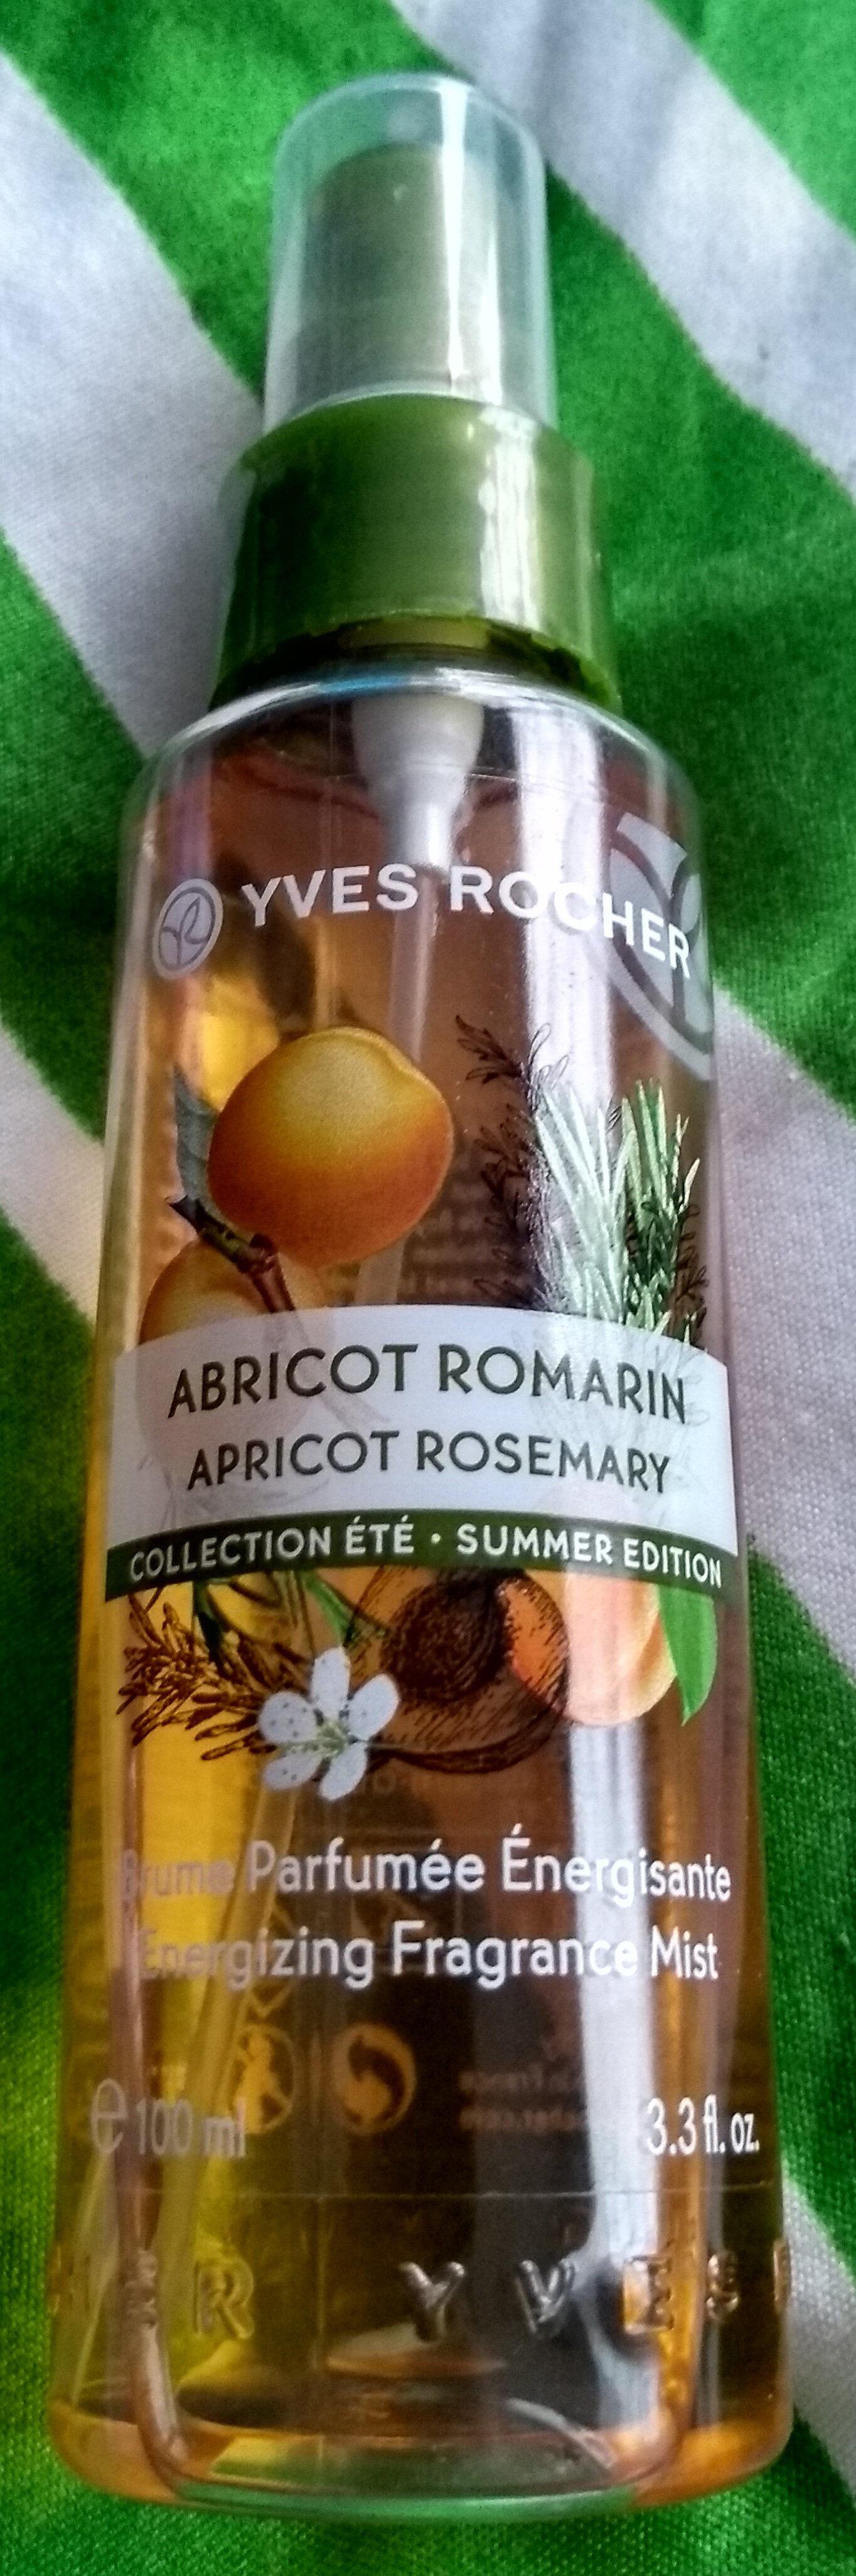 Brume Parfumée énergisante - Produit - fr